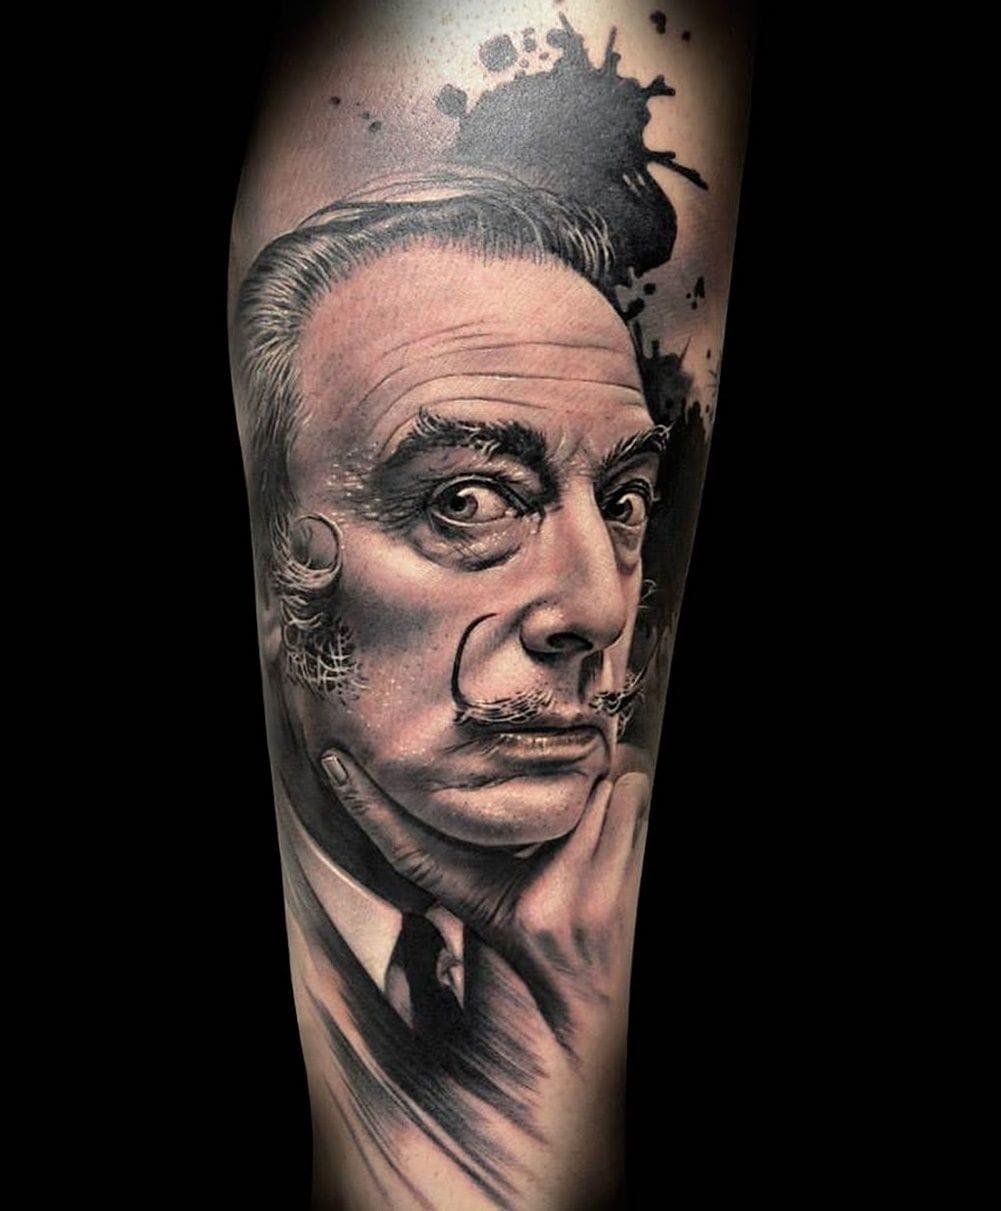 Awesome tattoo by Dani Martos